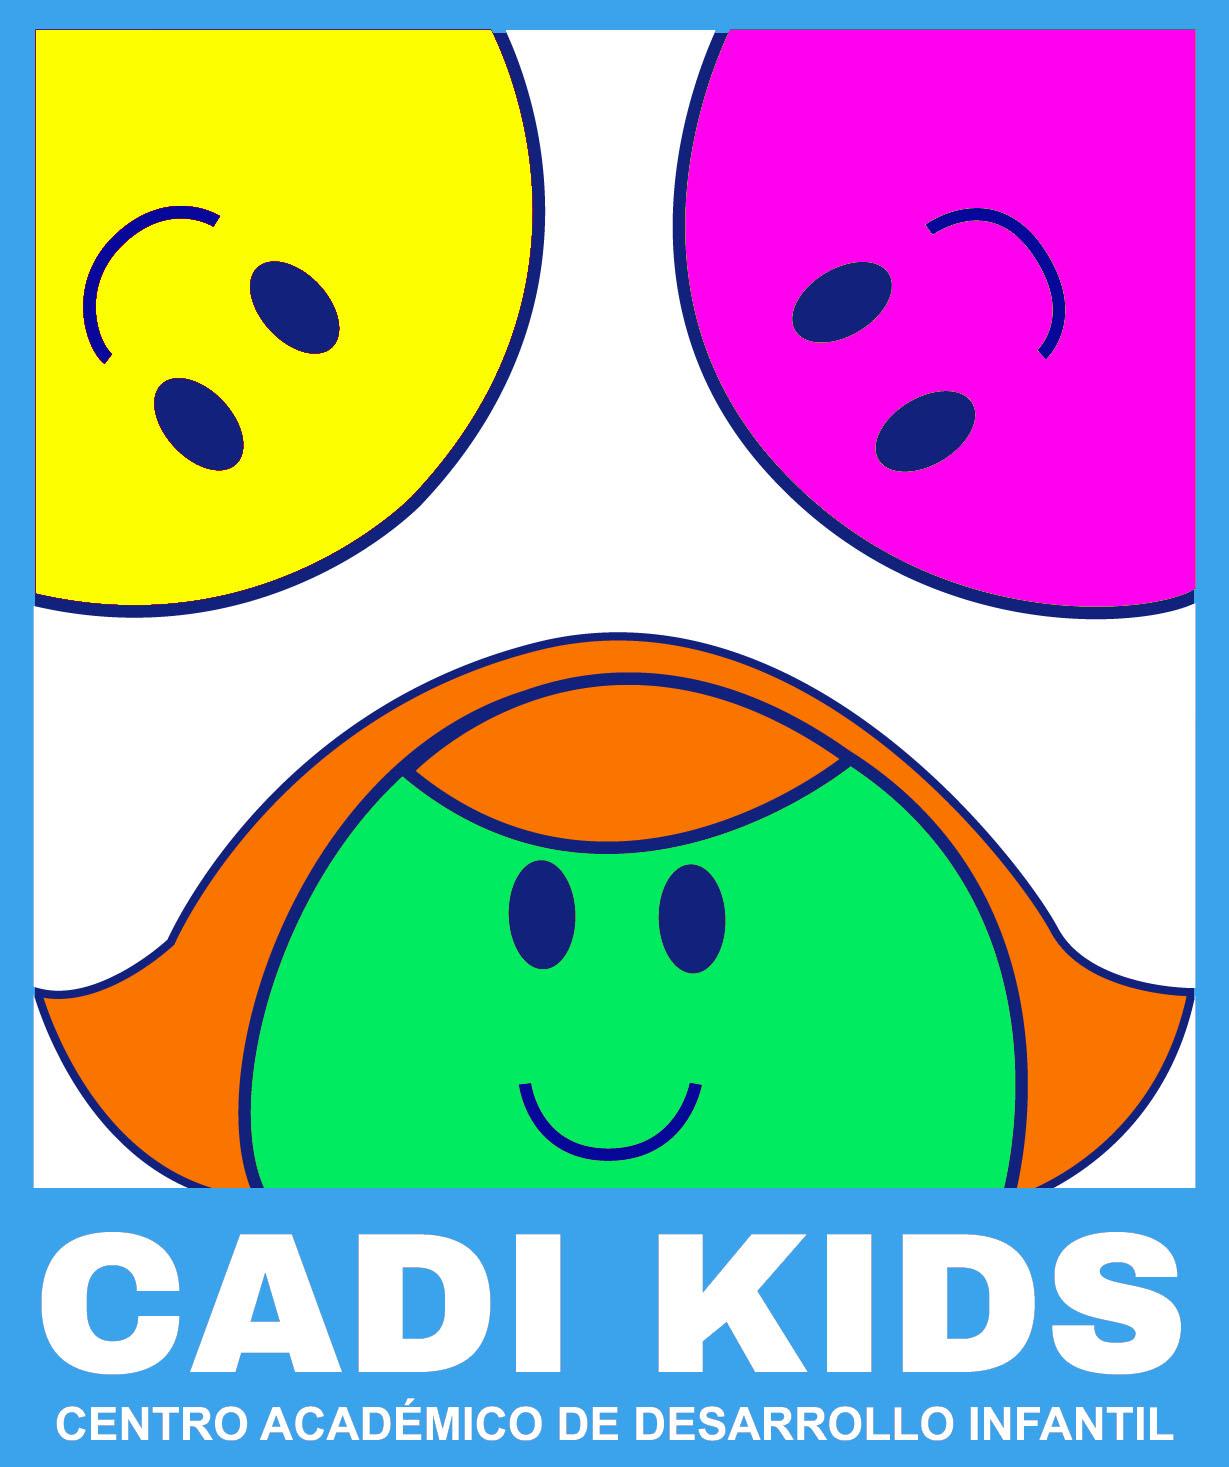 Cadikids